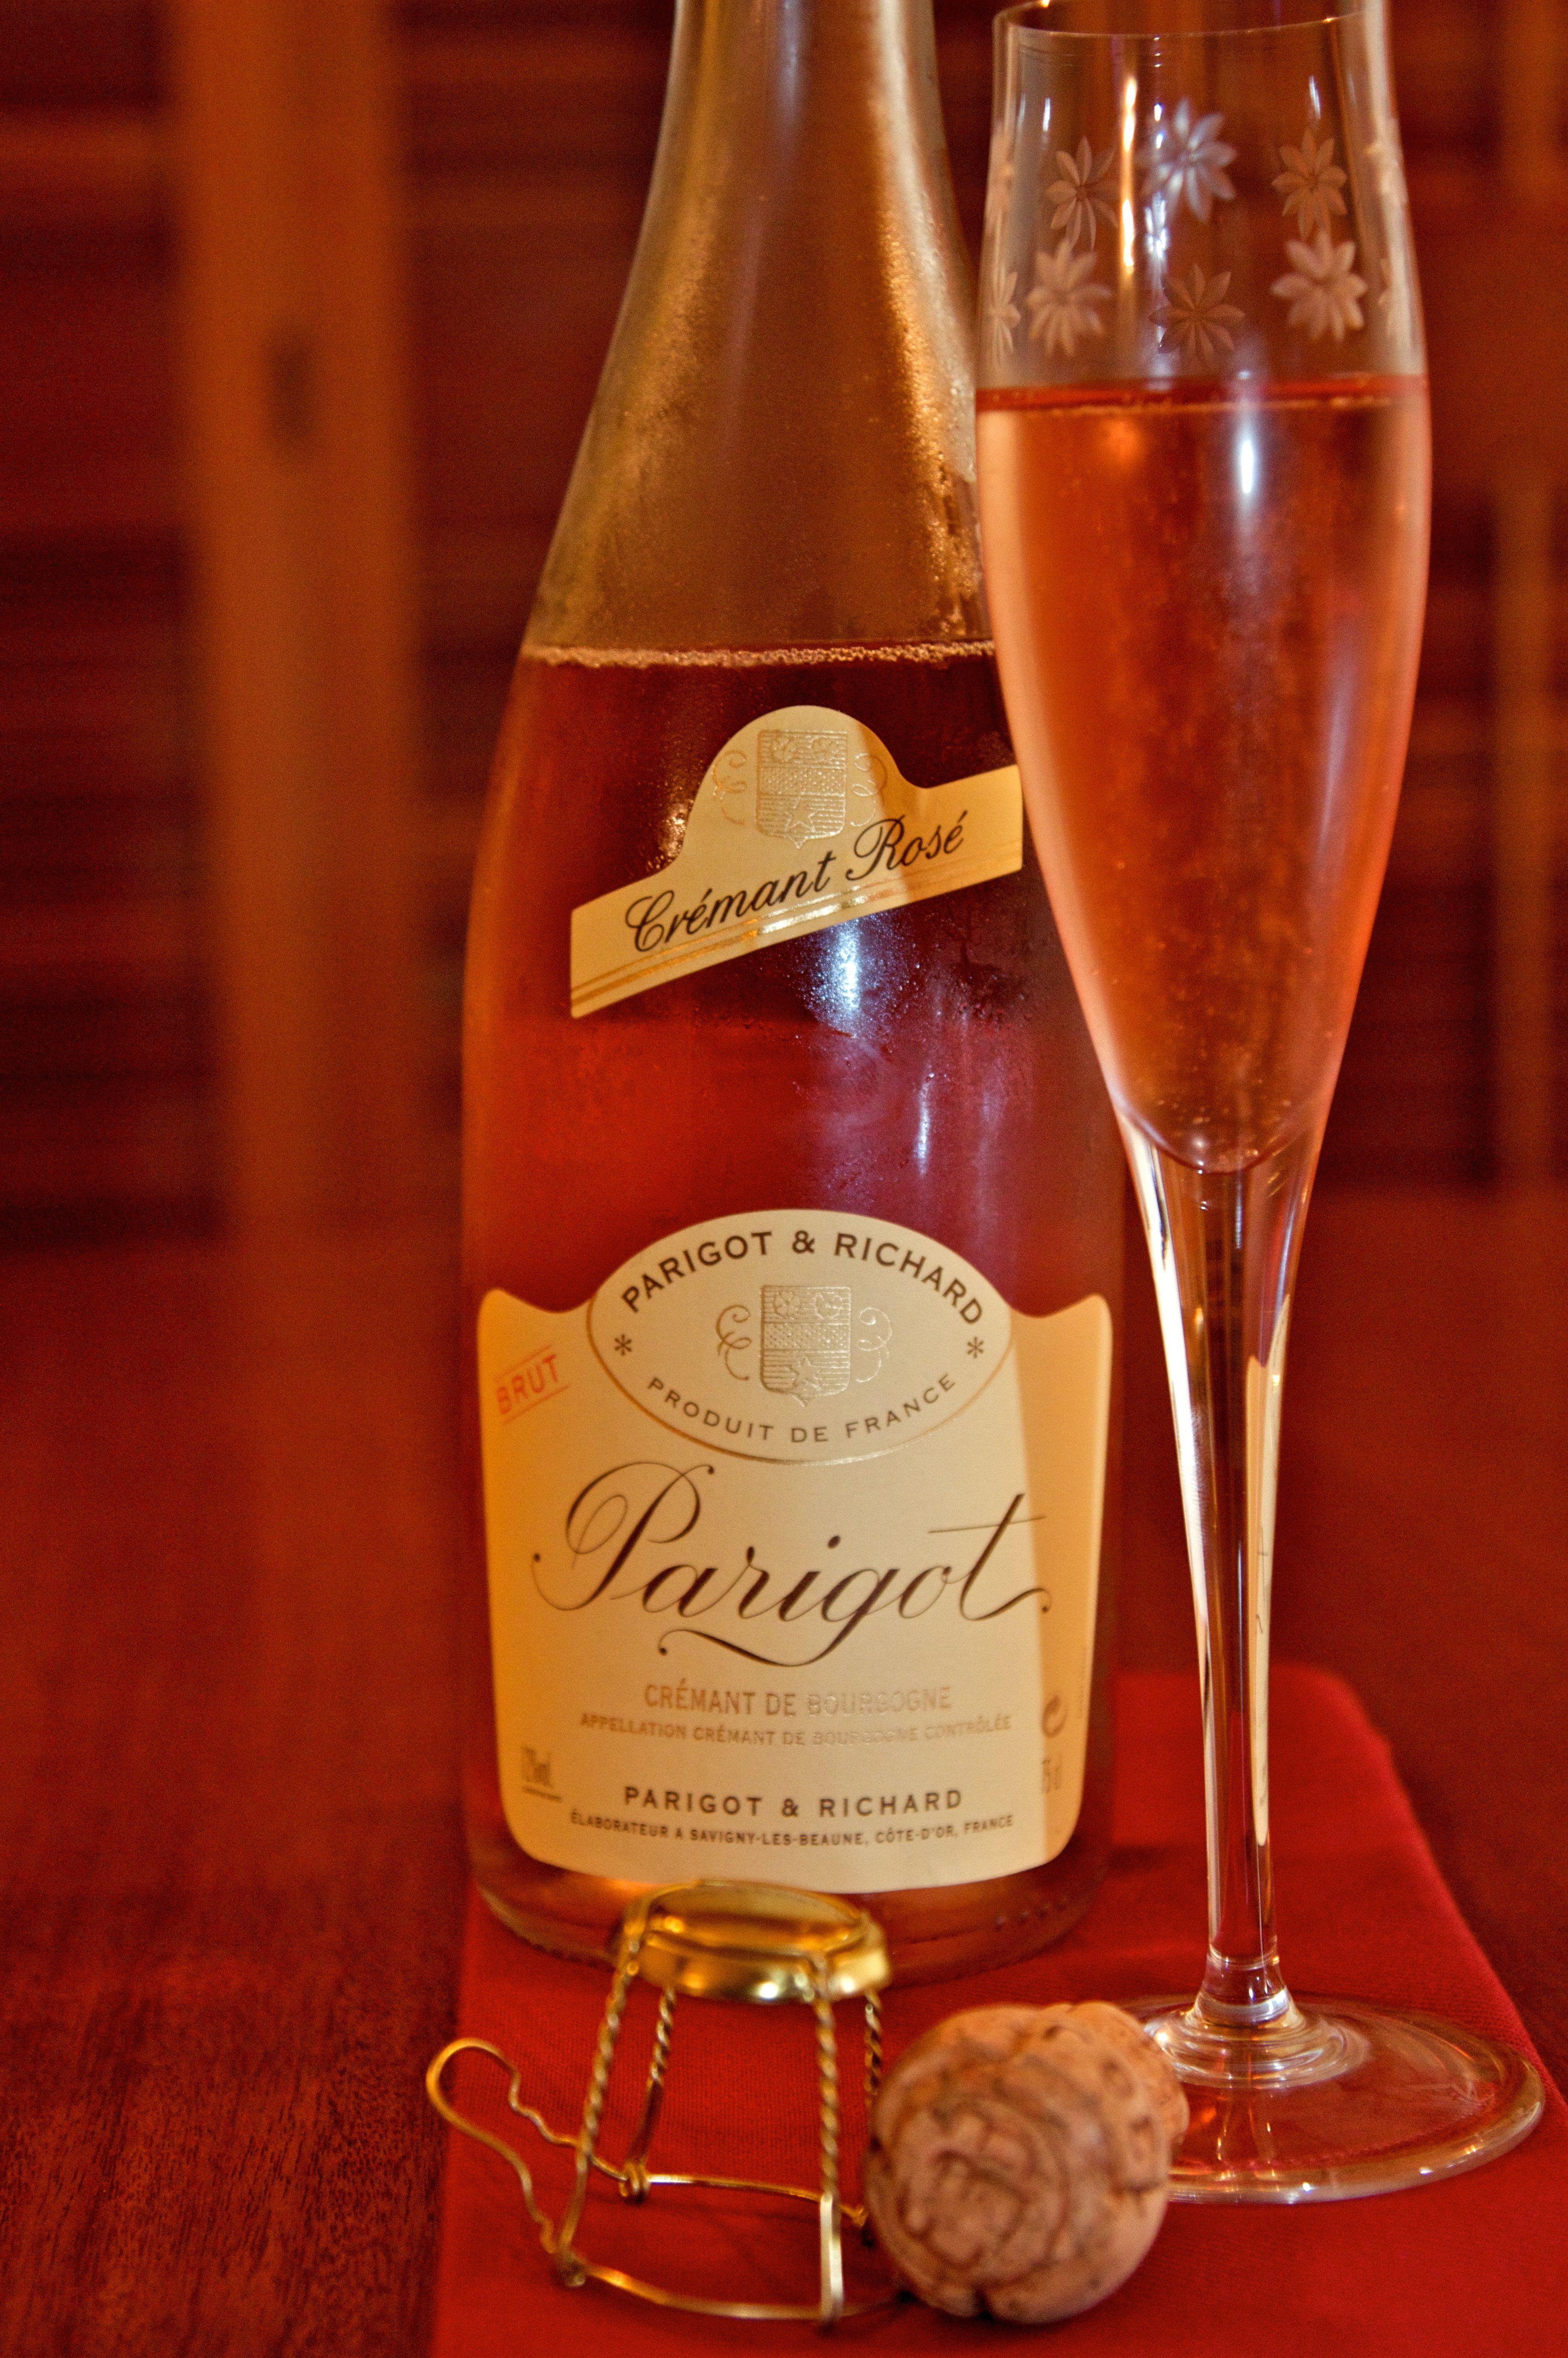 Parigot Rose Cremant De Bourgogne Wine Bottle Favorite Wine Sparkling Wine